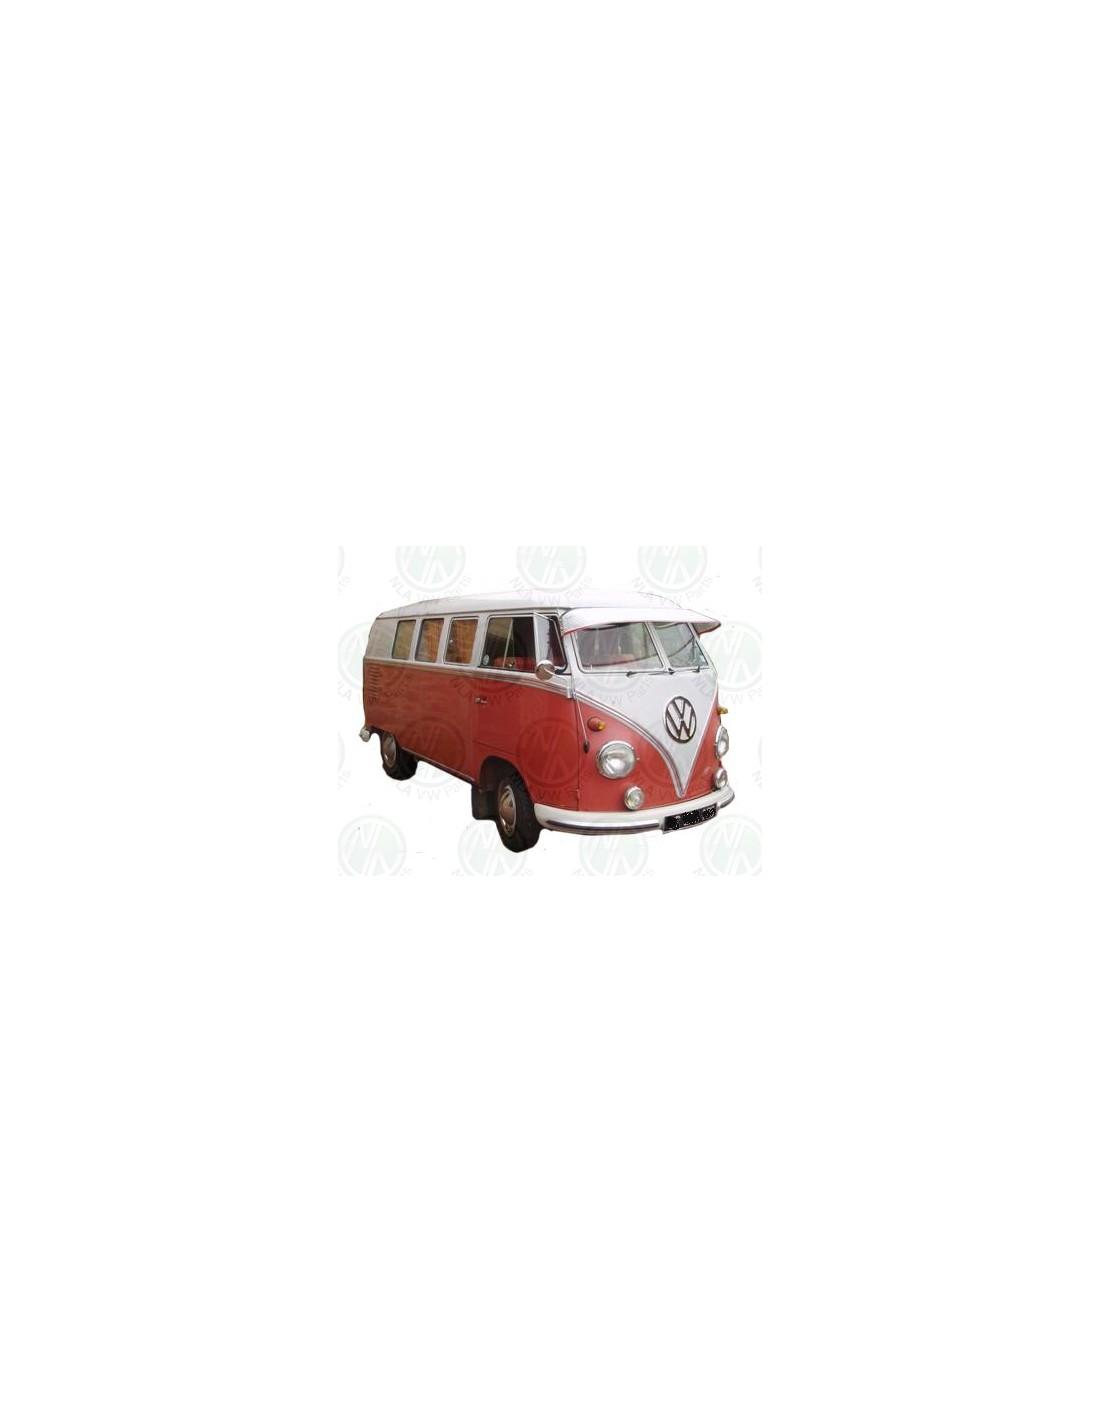 Volkswagen Bus Parts: Aluminium External Sun Visor For VW T2 Split Screen Bus